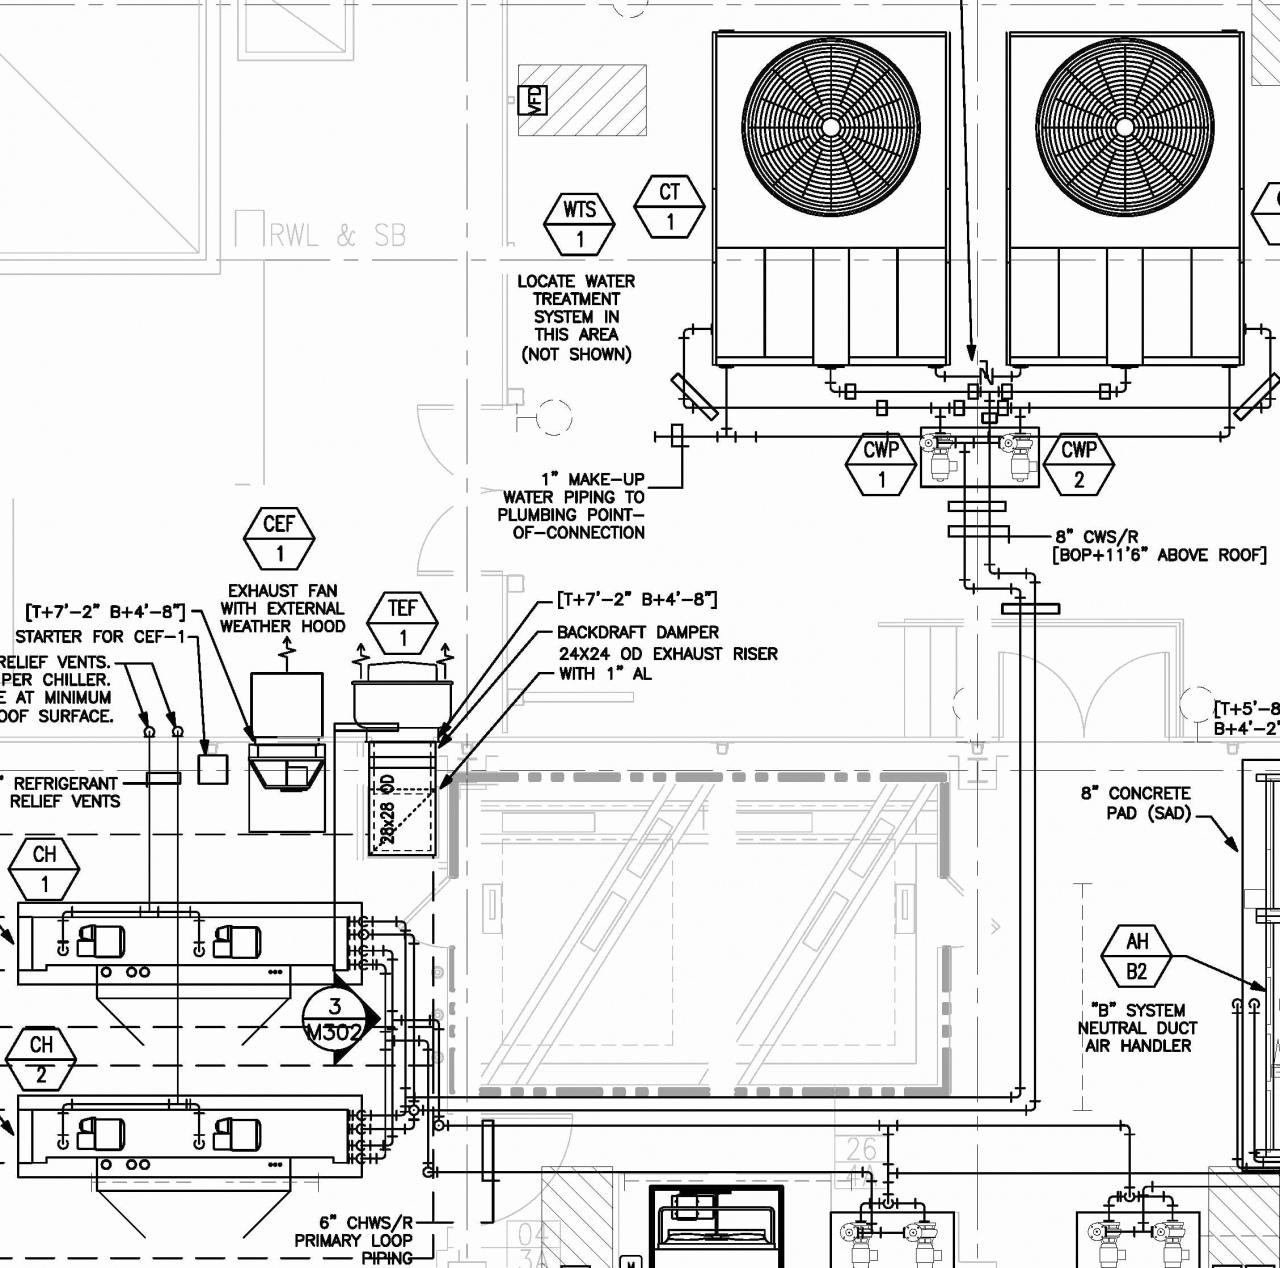 metal bed risers ideen fur terrassengestaltung page 80 durch metal bed risers